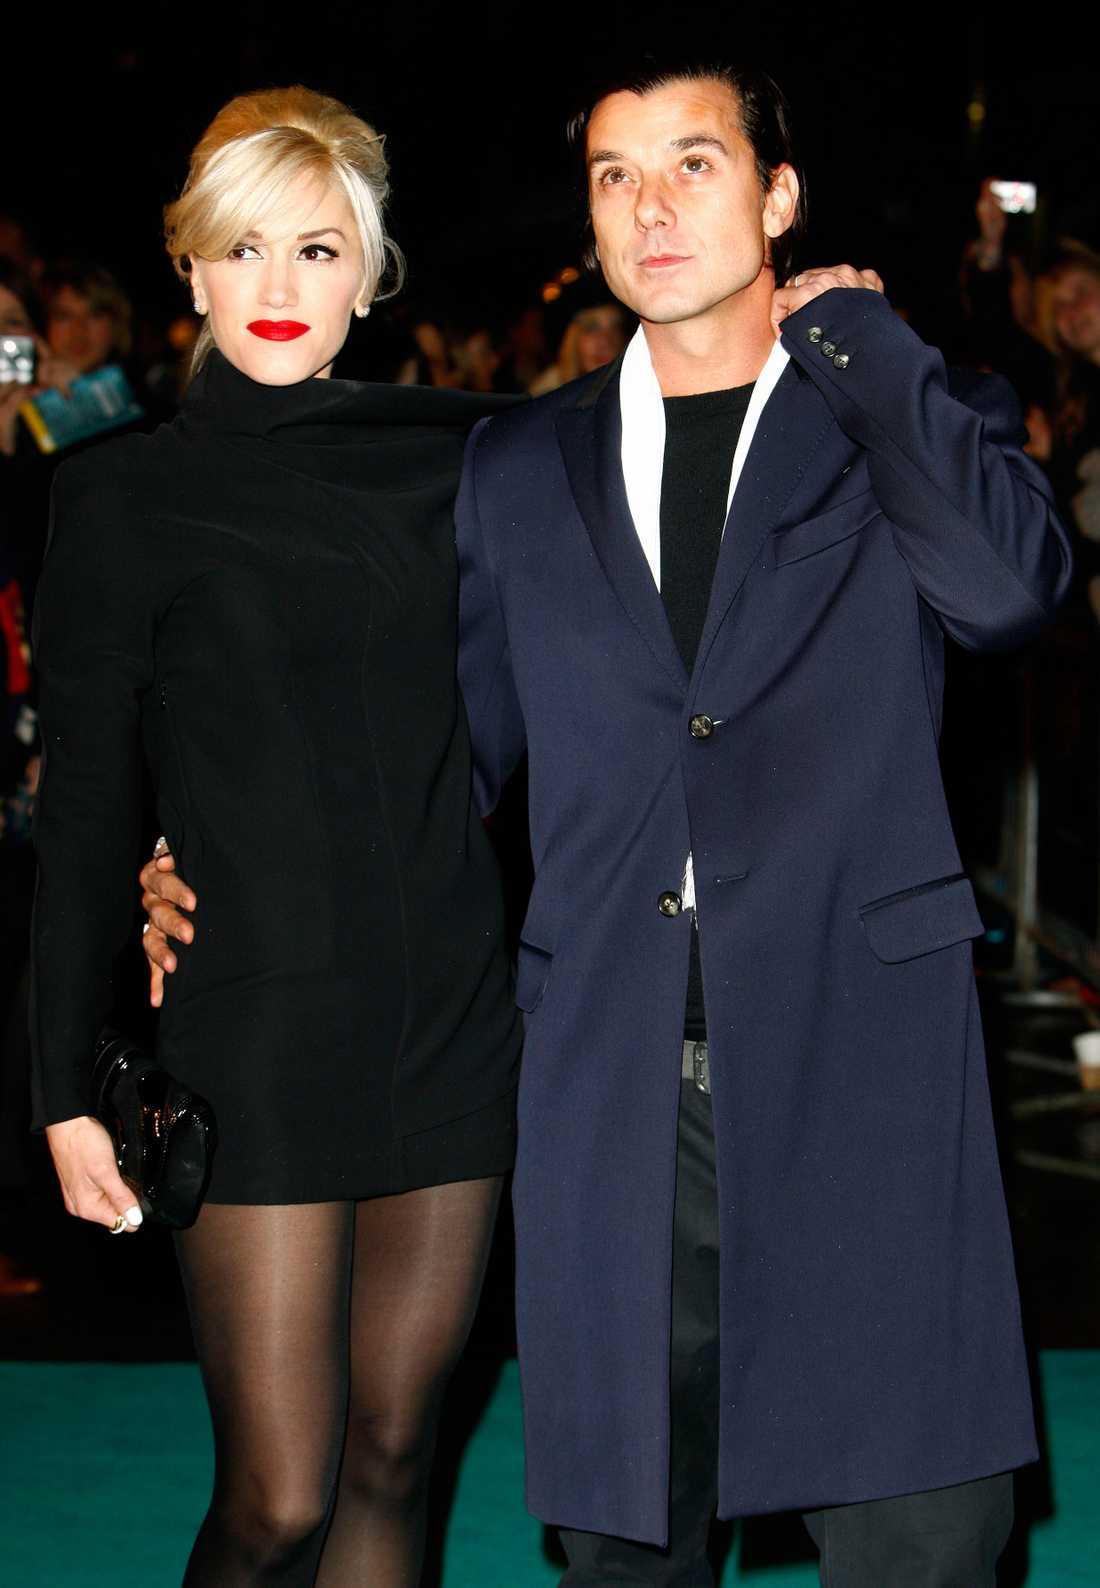 Gwens ex Gavin Rossdale gillade att se henne i tung makeup.